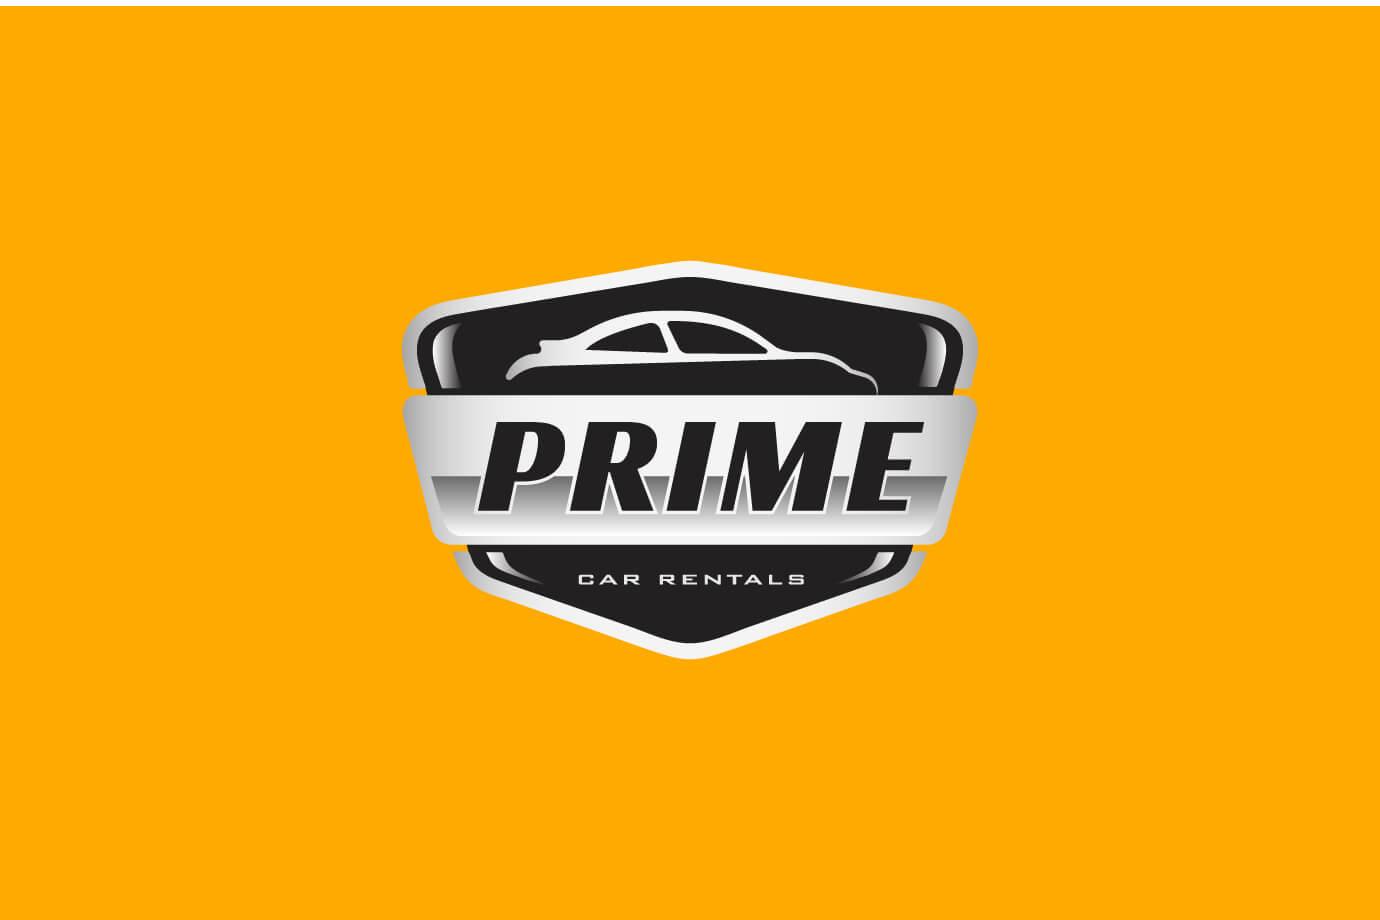 Prime Cars Logo by Freelance Graphic Designer SAJID SULAIMAN